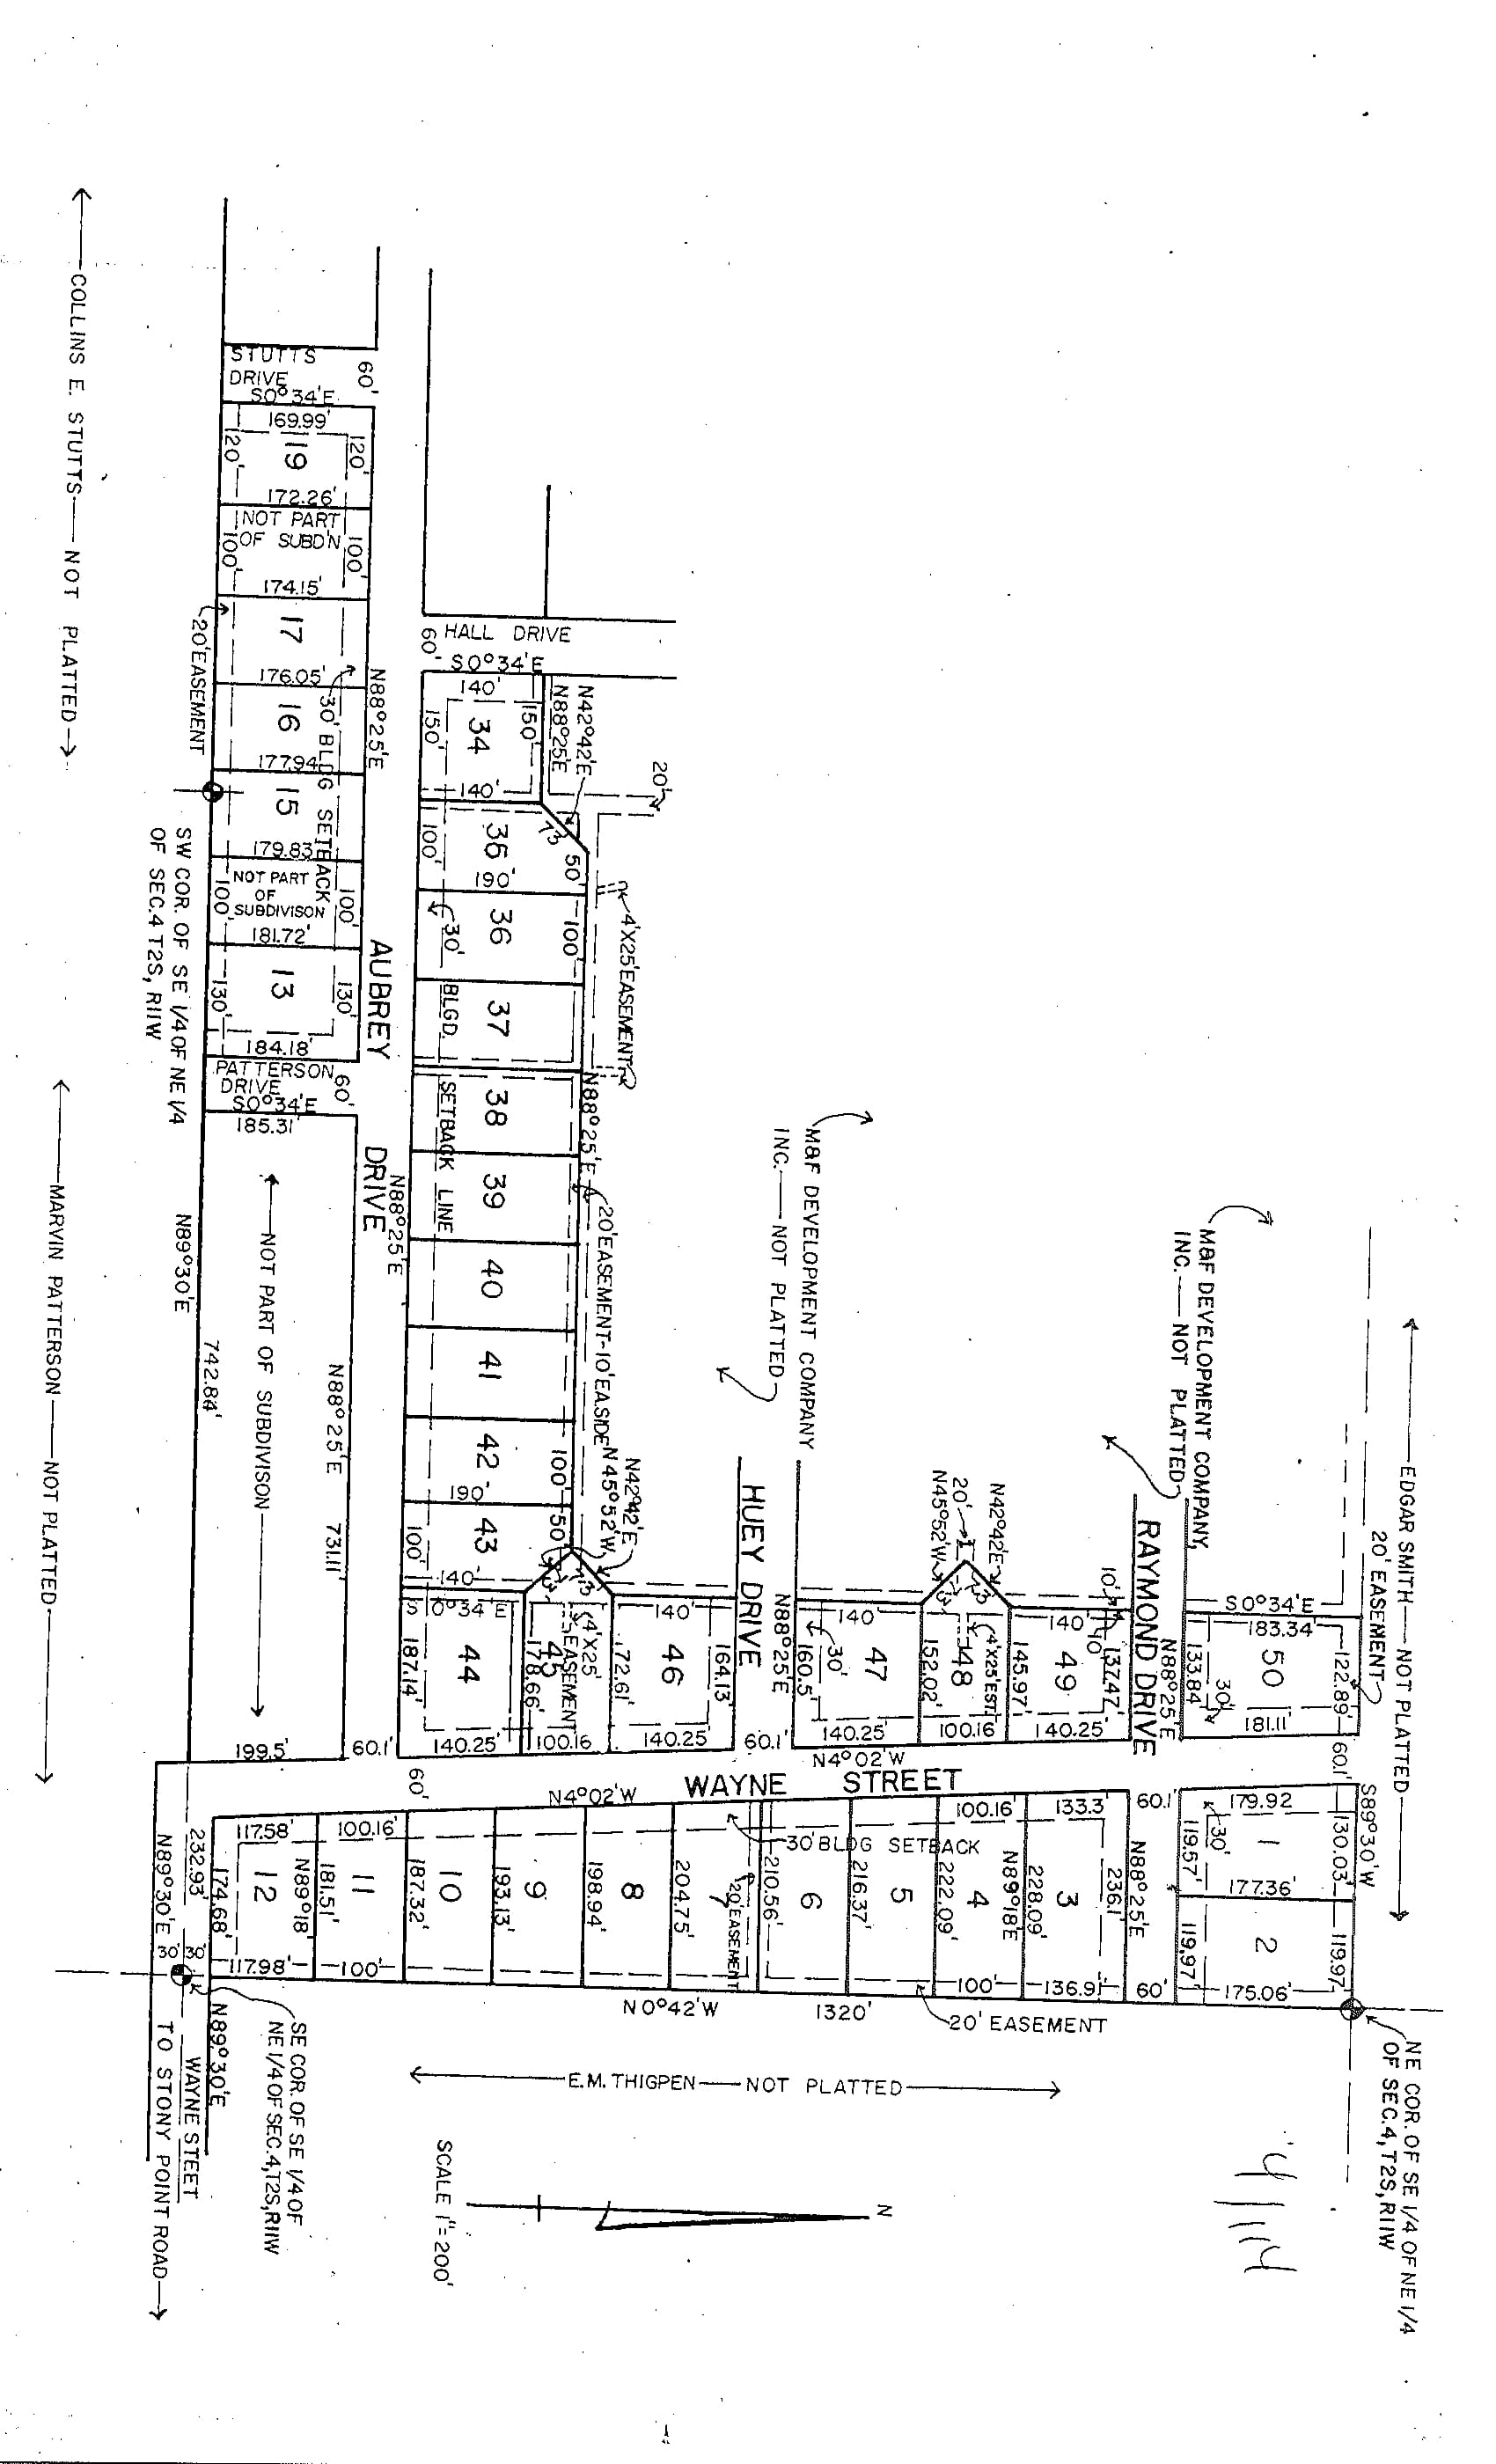 Plat-North-Gate-Estates-2.jpg